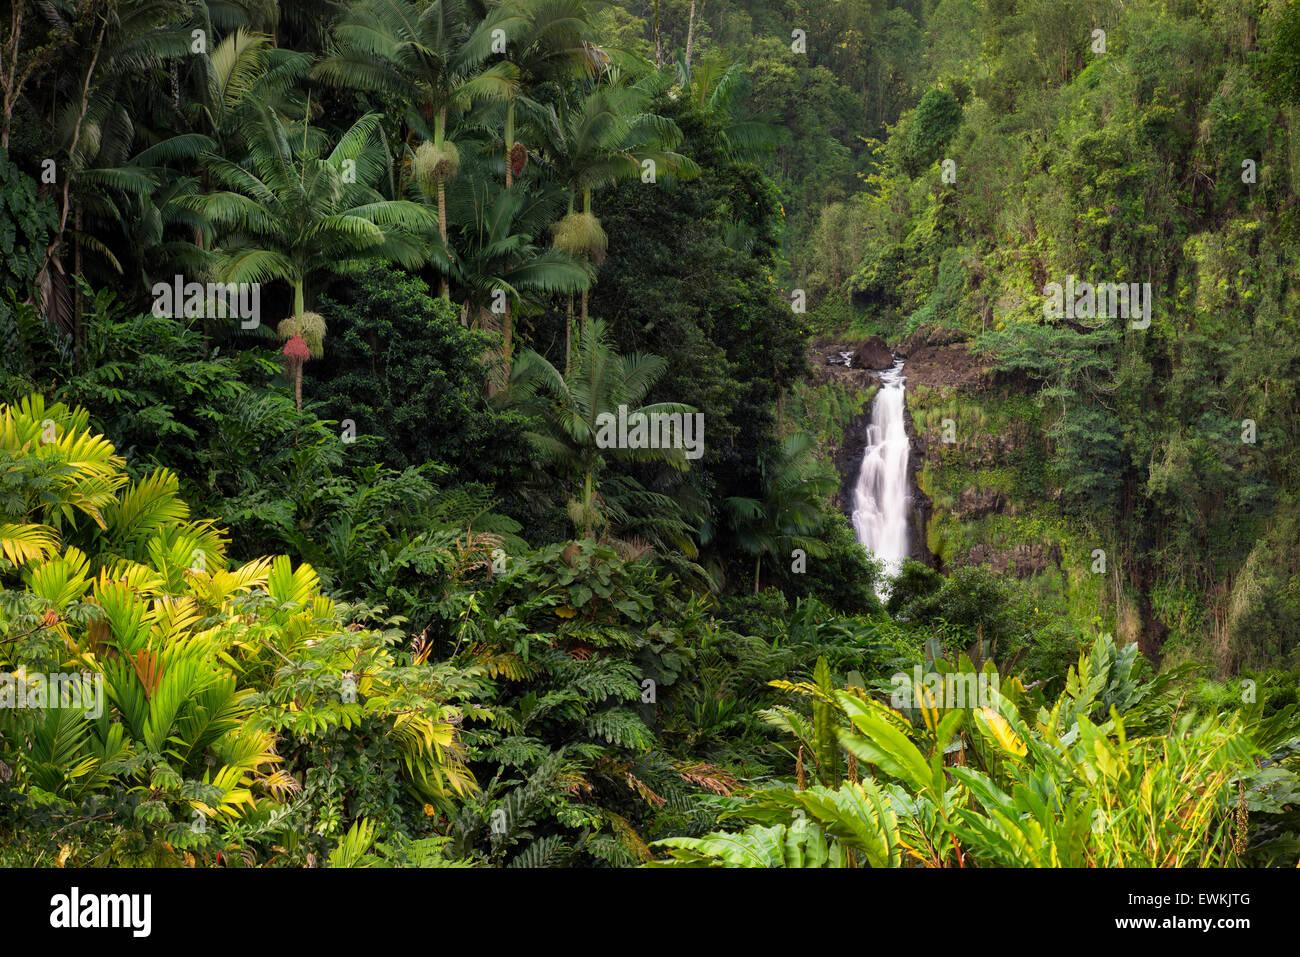 Akaka Wasserfälle. Akaka Falls State Park. Hawaii, Big Island Stockbild